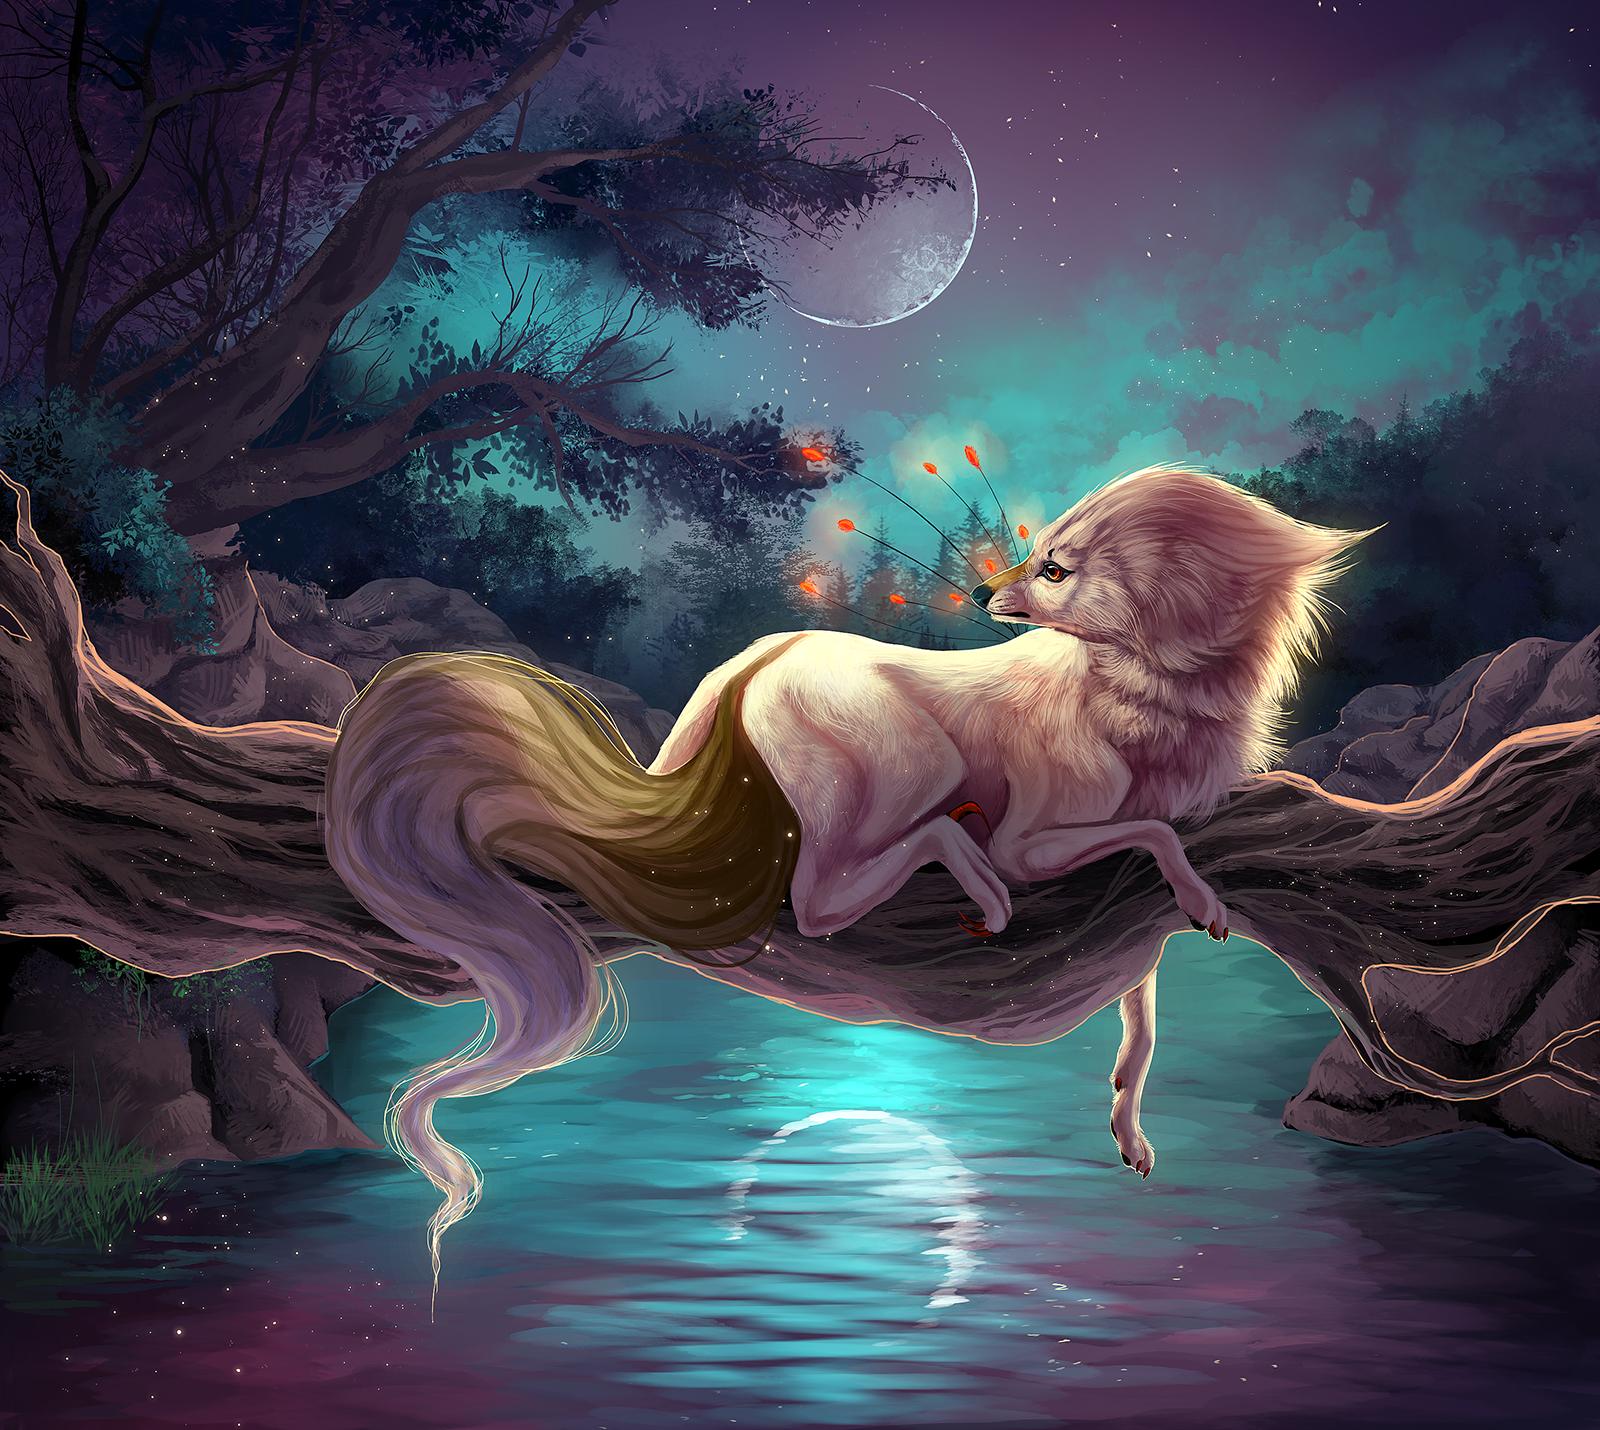 Goodnight Moon by Llassie